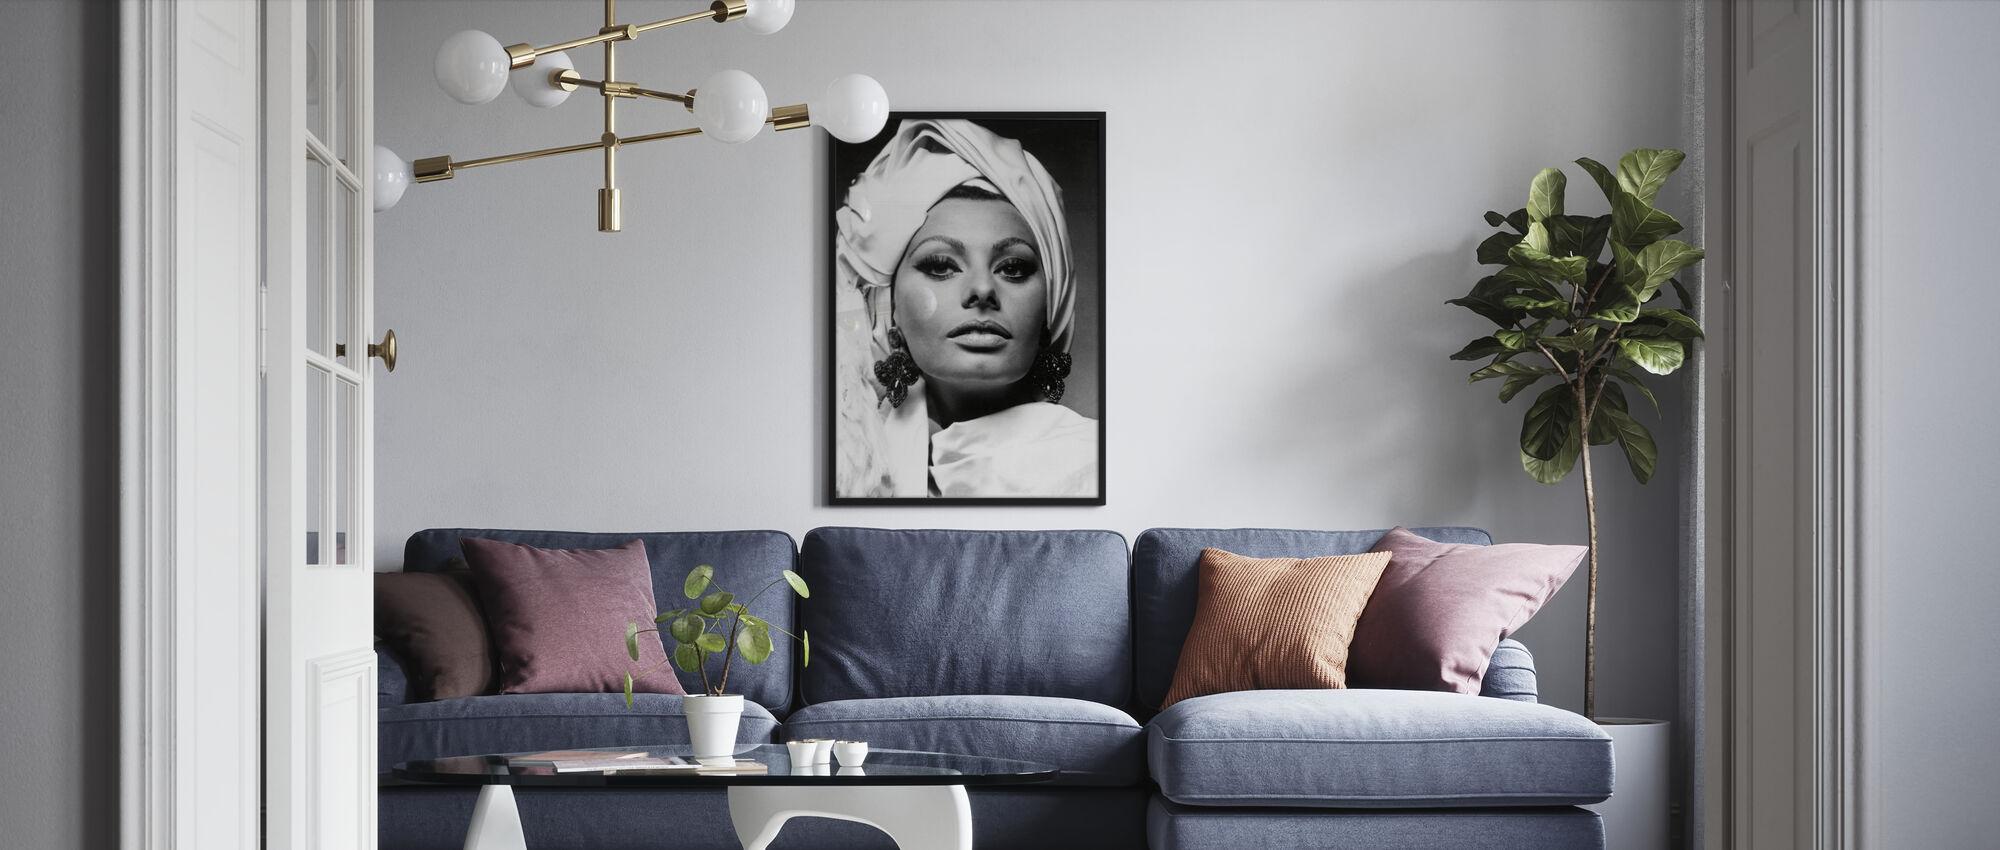 Arabesque - Sophia Loren - Ingelijste print - Woonkamer